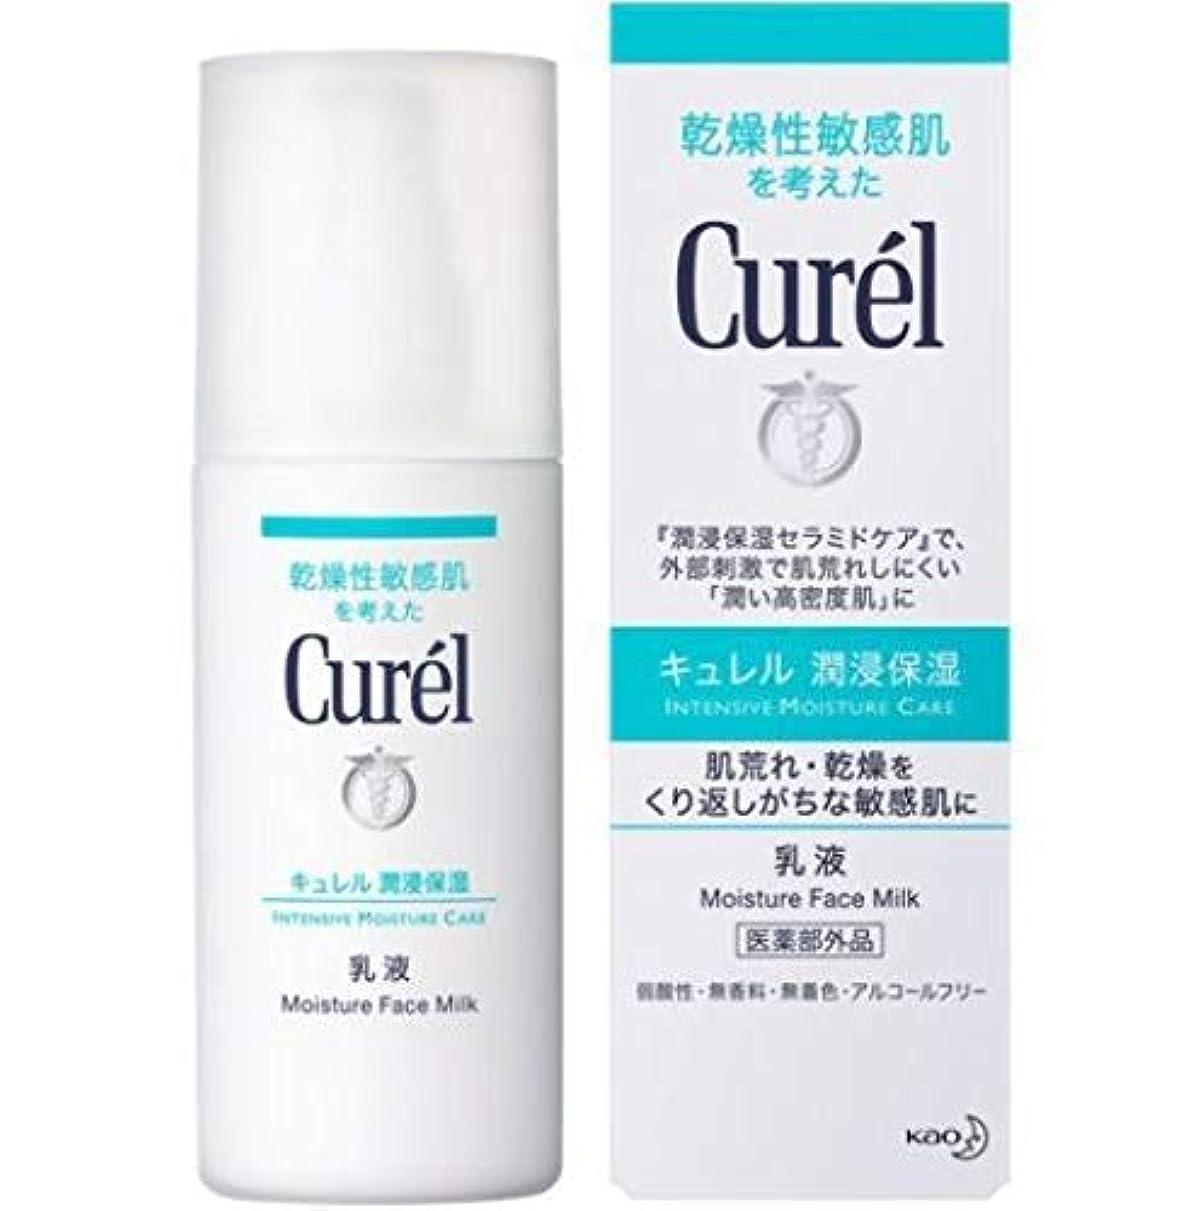 Curél キュレルの保湿集中治療保湿フェイスミルクは120ミリリットルは、お肌の自然なバリア機能を向上させ落ち着かせると乾燥から肌を保護するために-helps